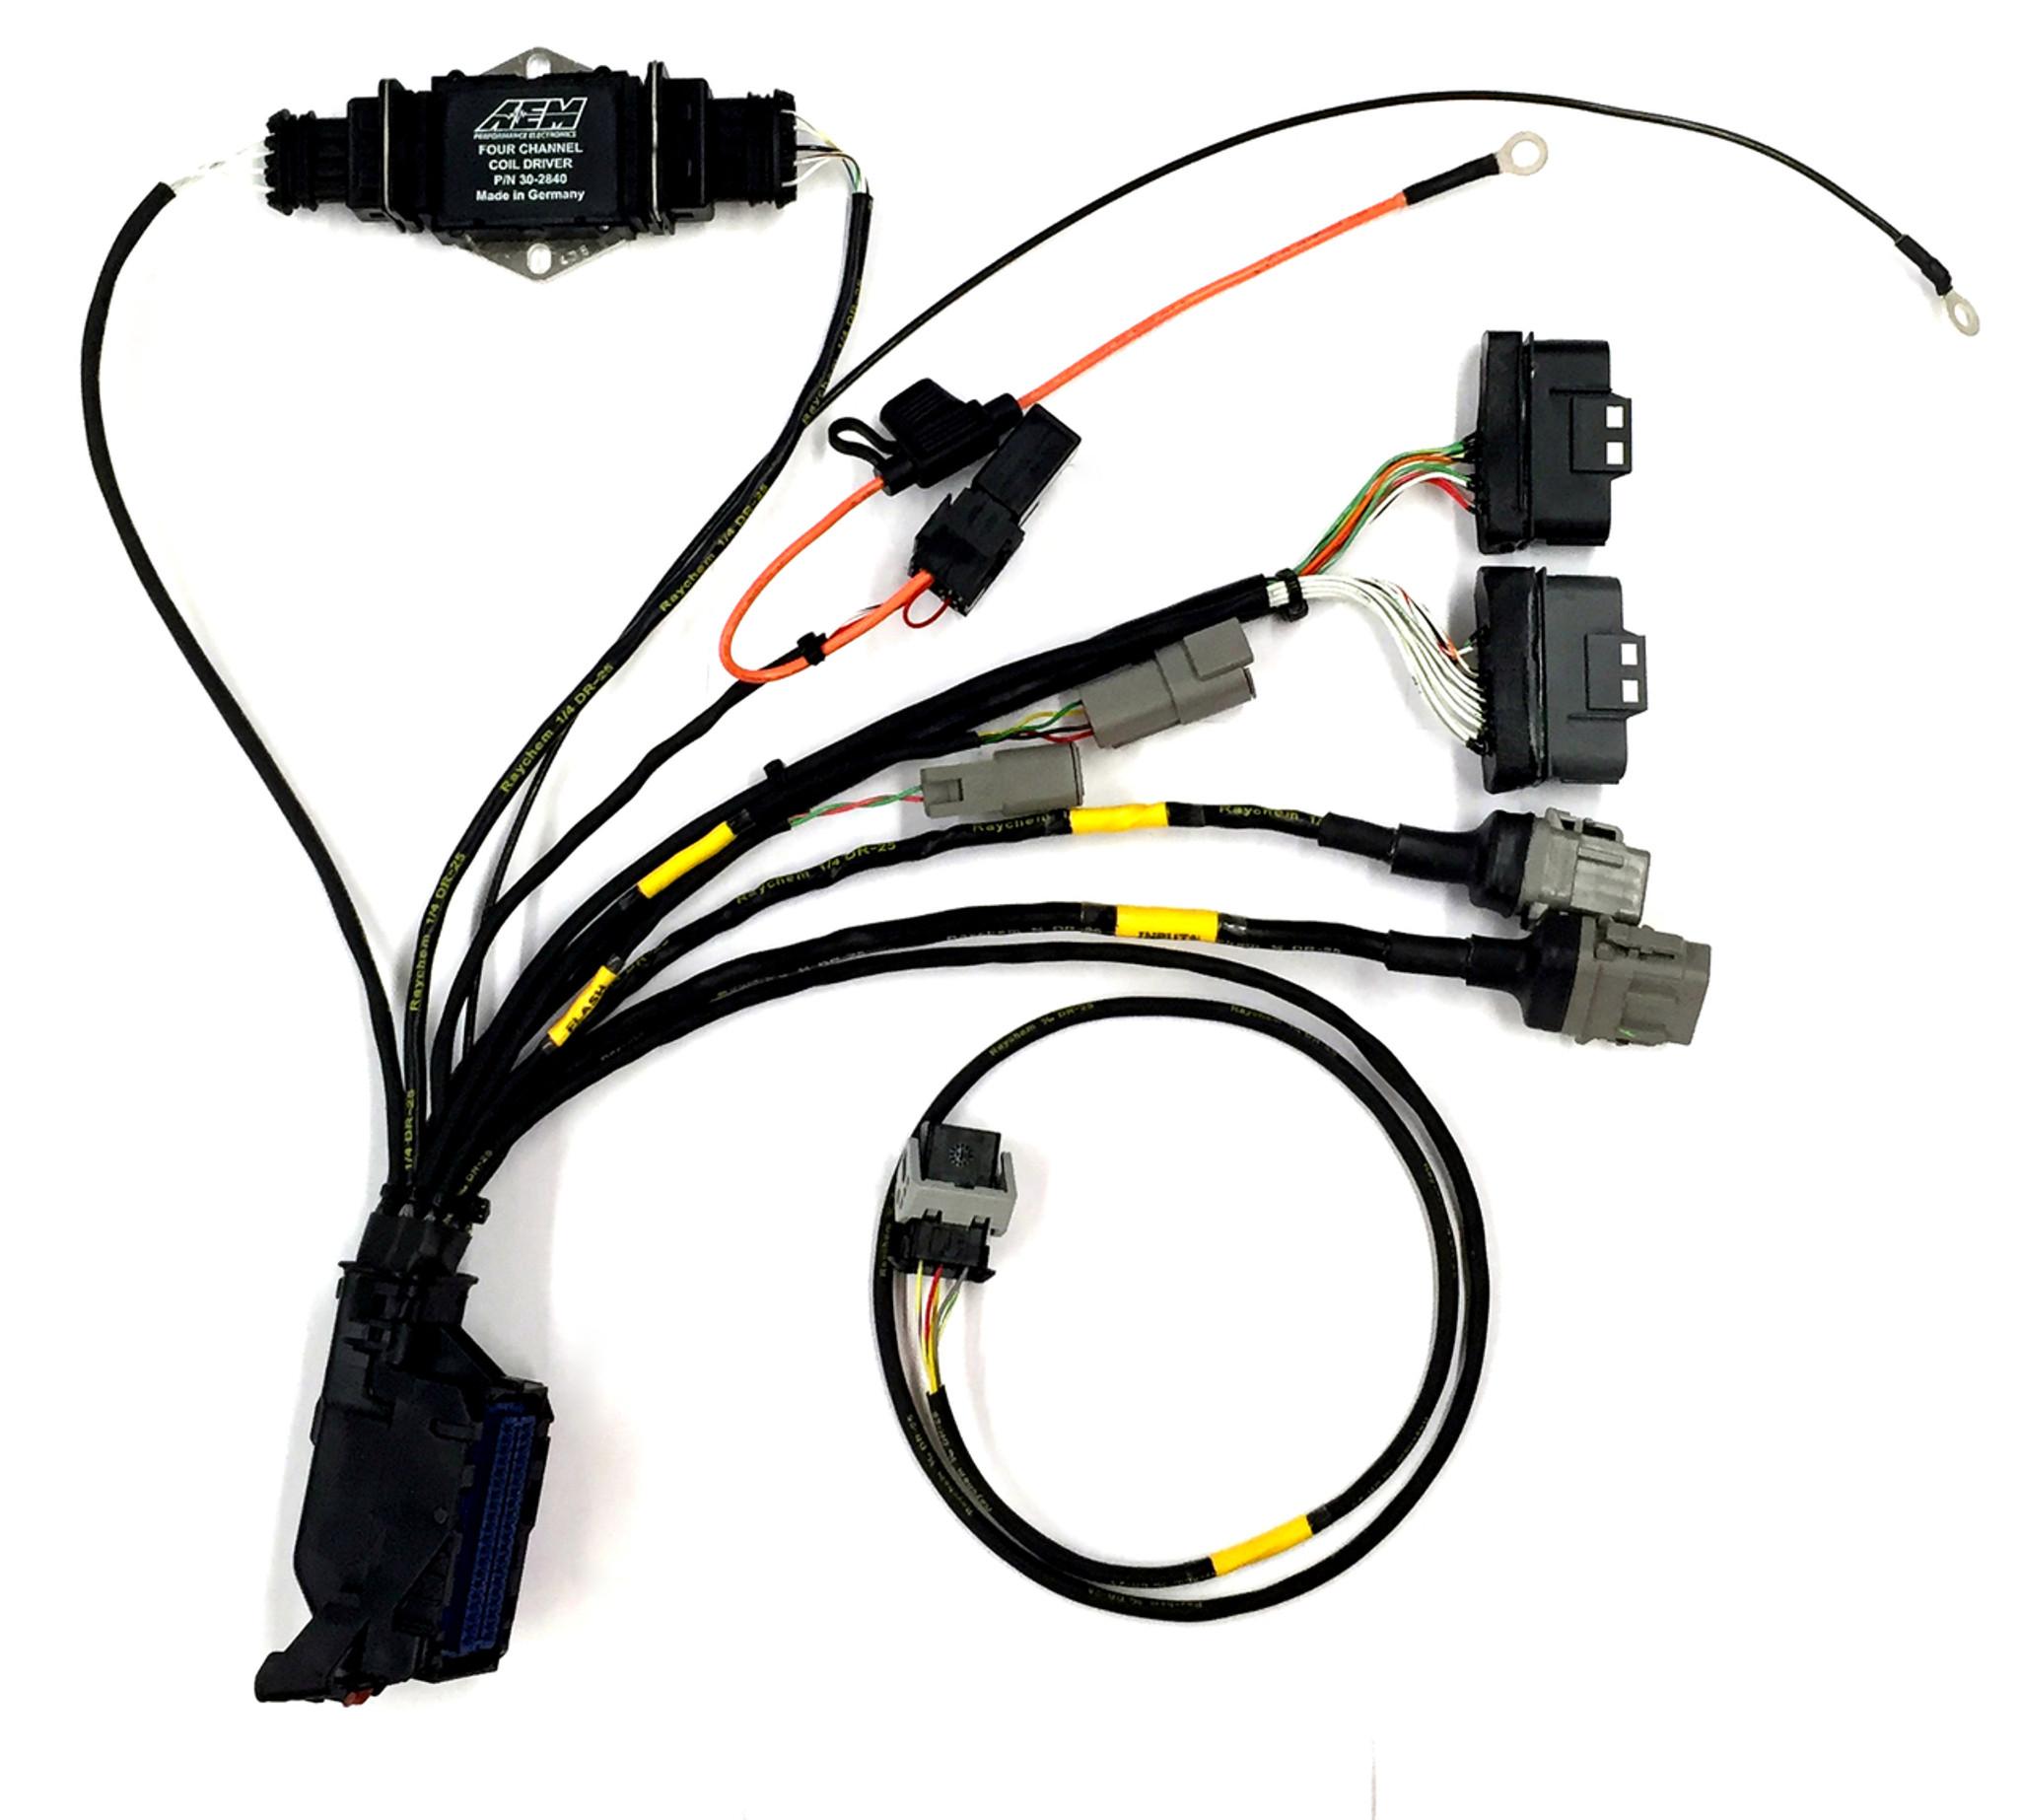 medium resolution of infinity ecu plug and play wiring harness shop htp aem fic wiring harness aem wiring harness